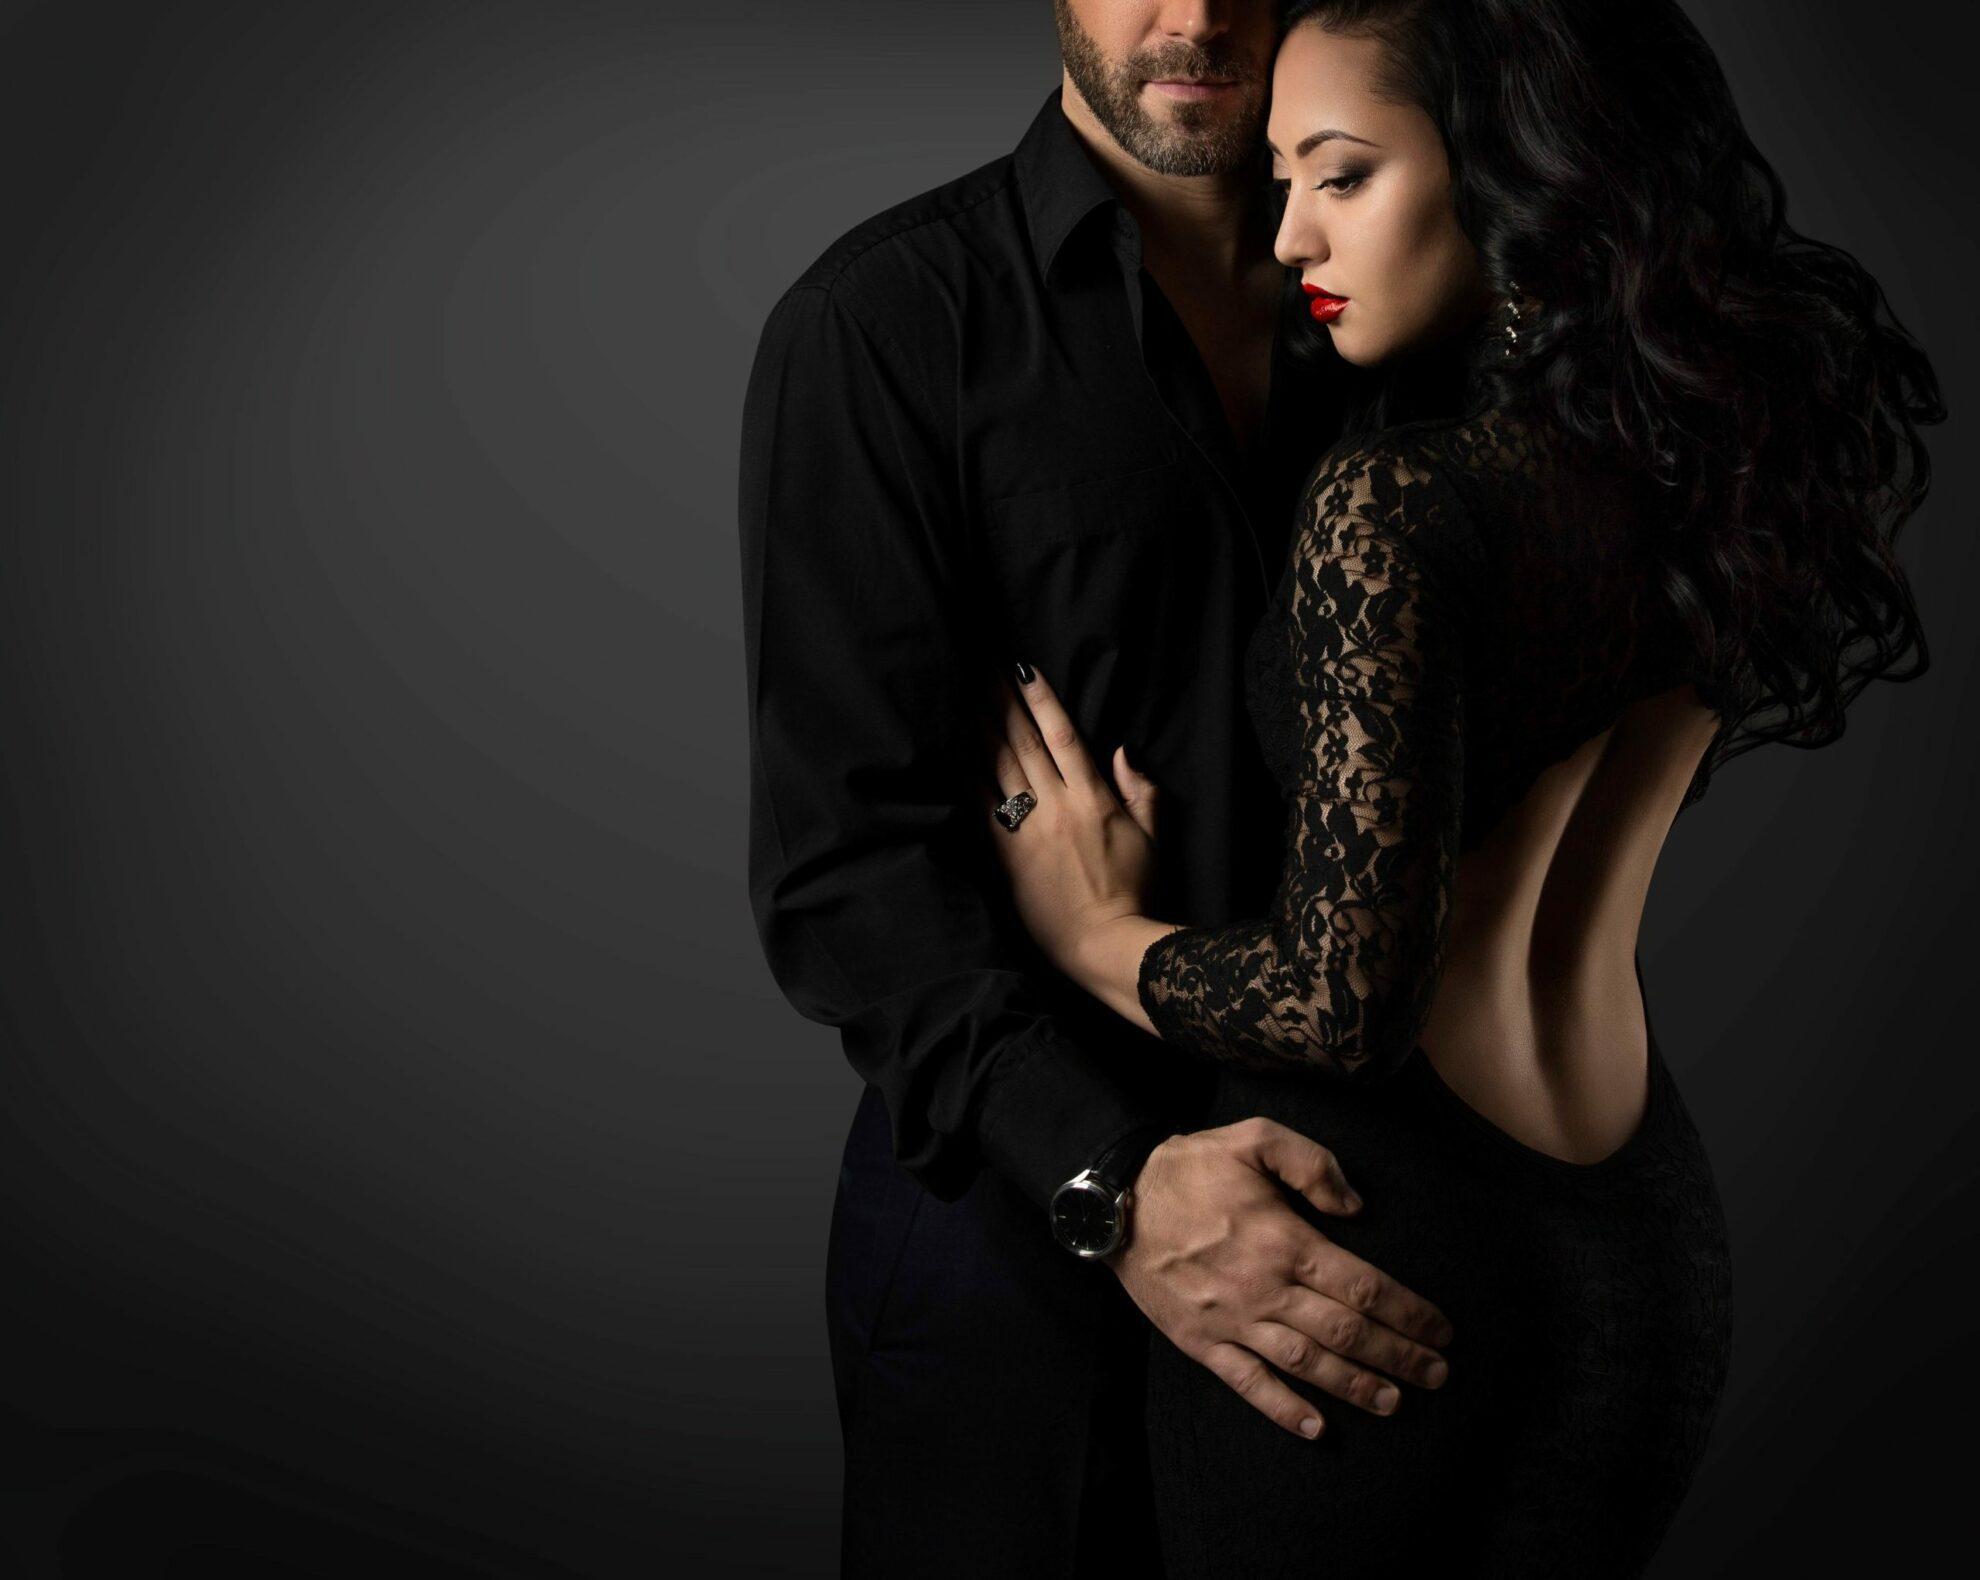 male escorts for asian women